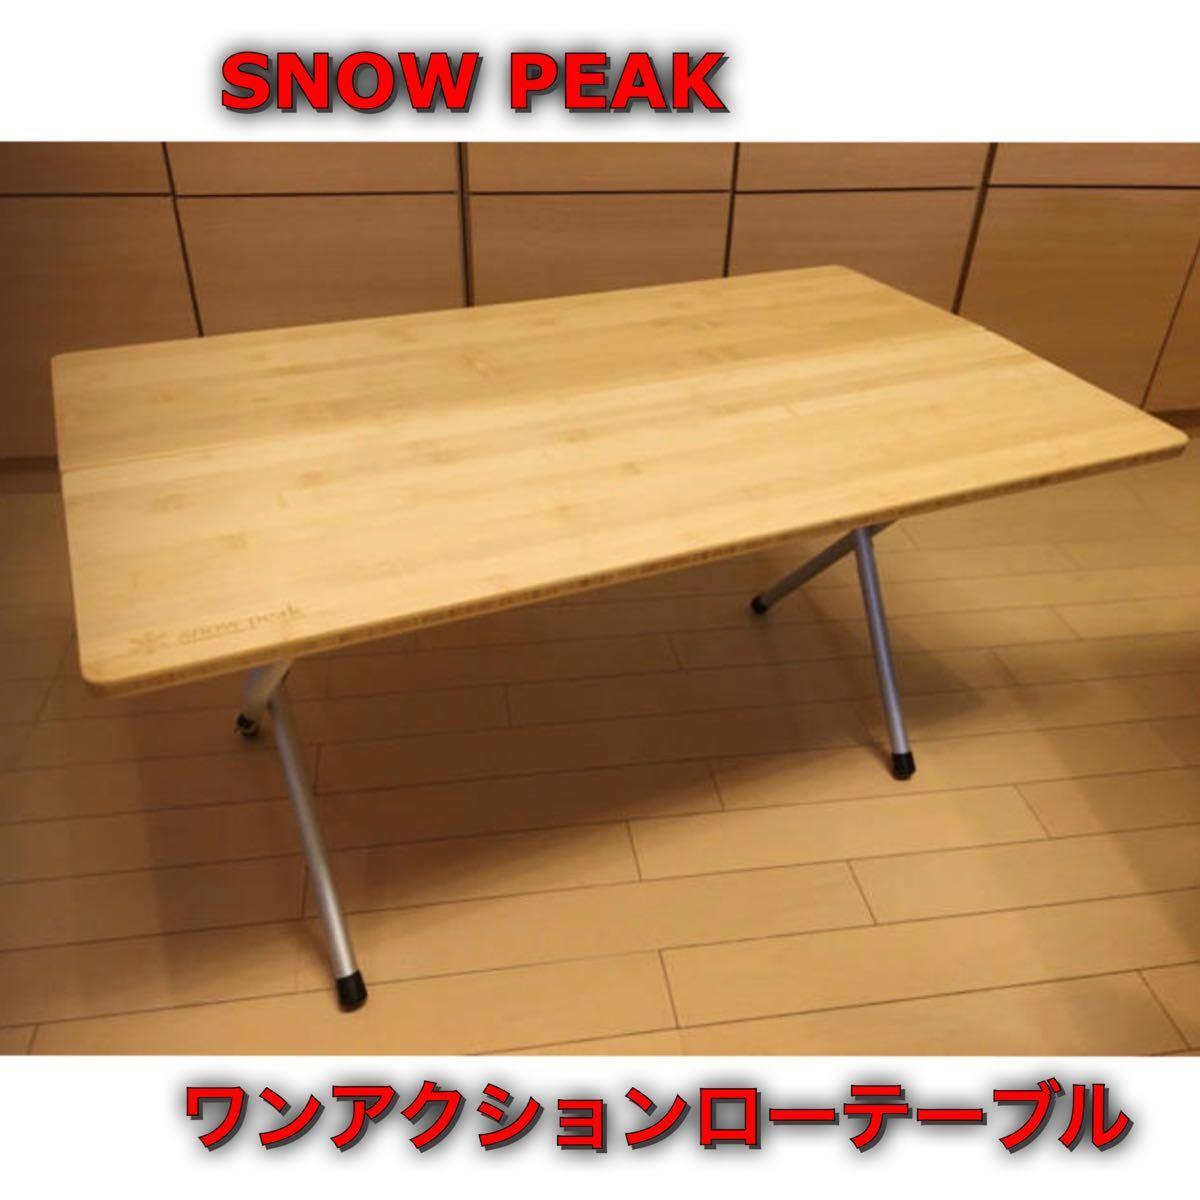 snow peak ワンアクションローテーブル スノーピーク LV-100T